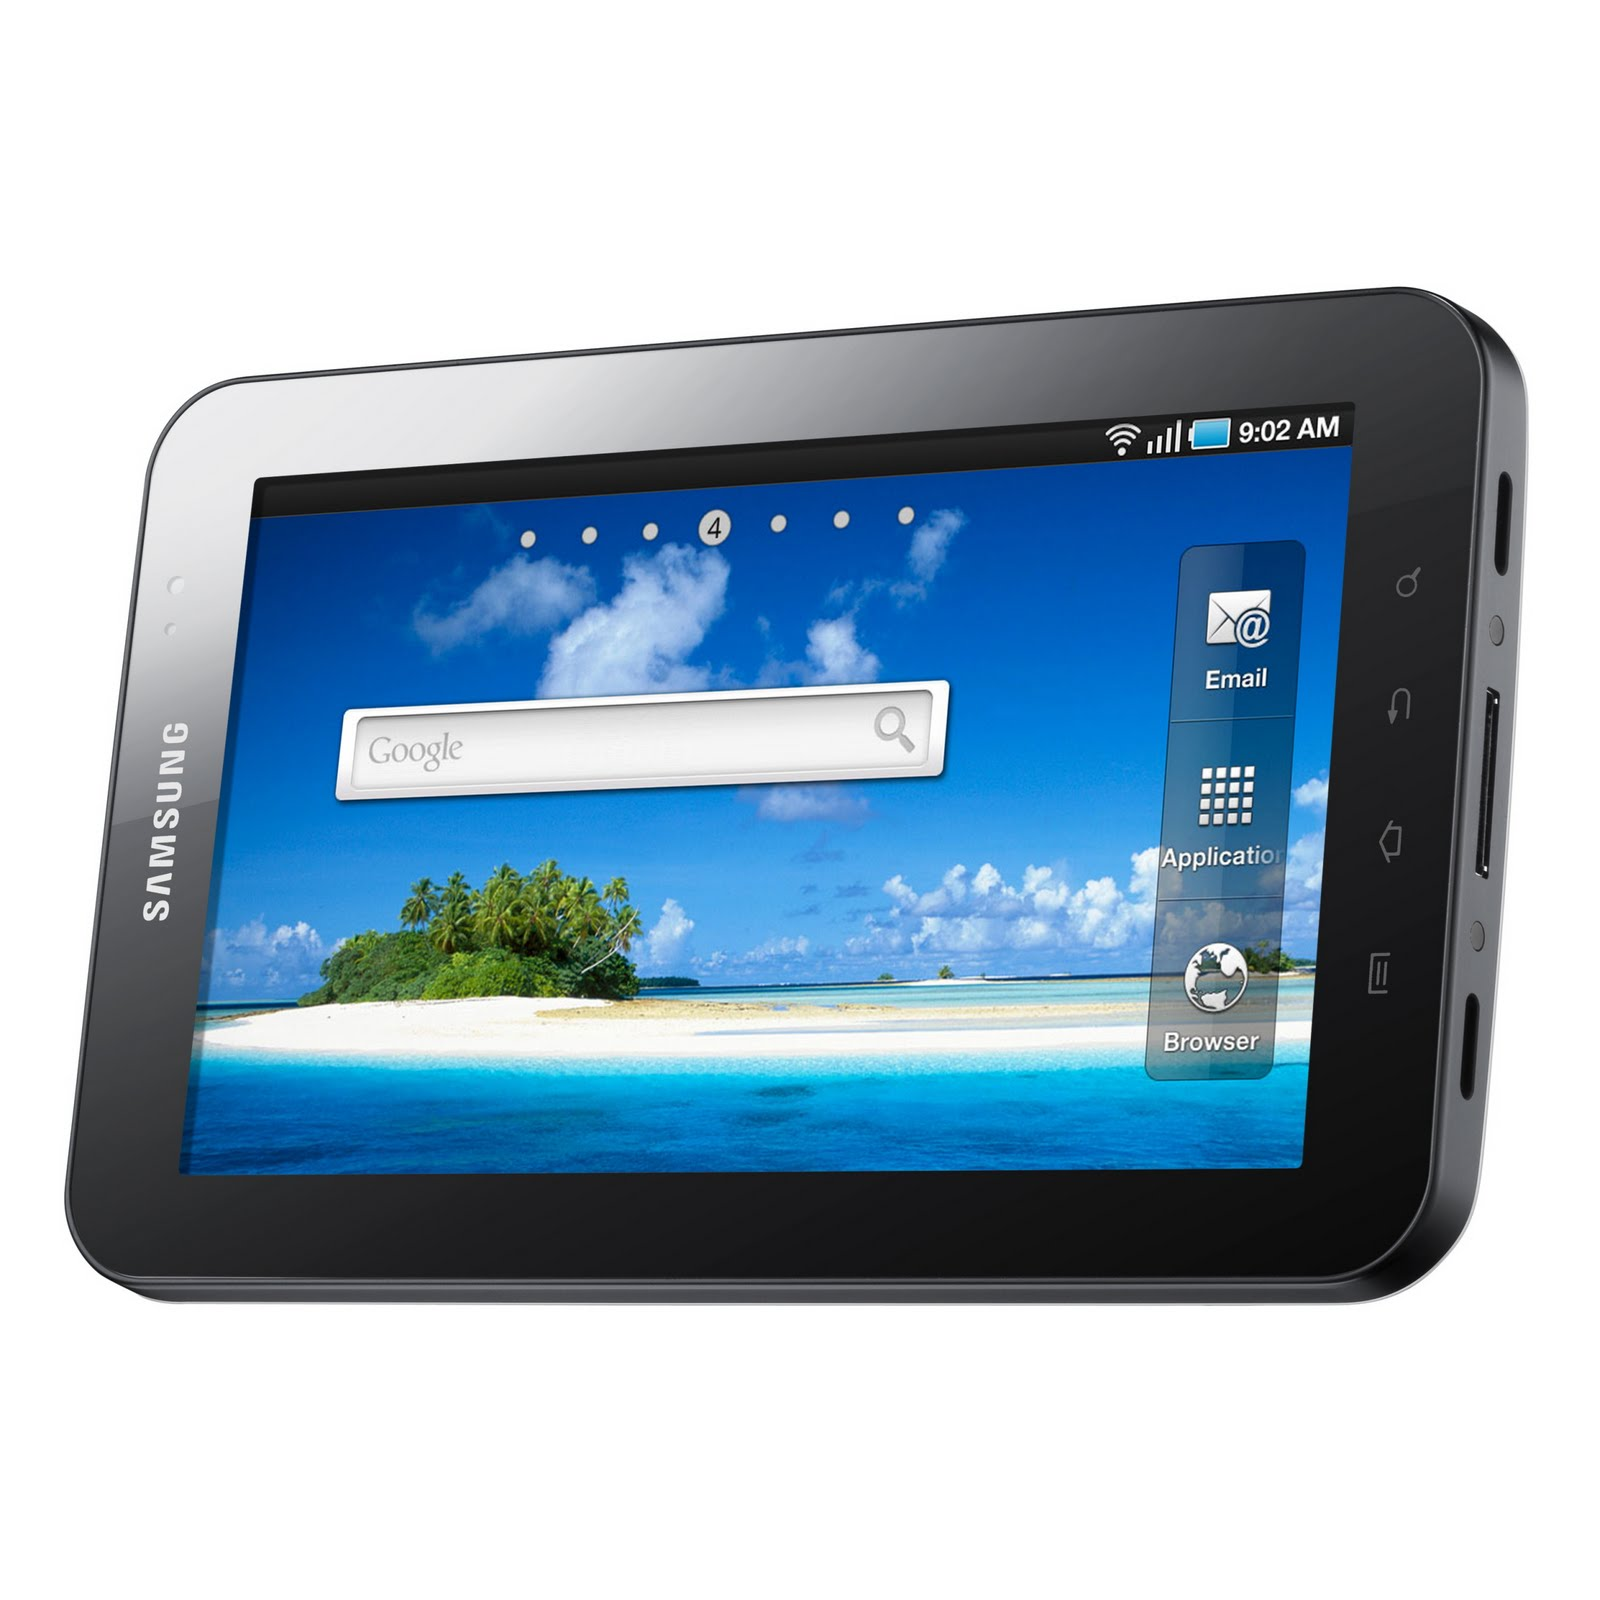 http://4.bp.blogspot.com/_PyzGklHH3A4/TLy5md2MC0I/AAAAAAAAAto/0M9kSfgYCpk/s1600/Samsung_GalaxyTAB_P1000_produkt_Ordinateur_portable7.jpg